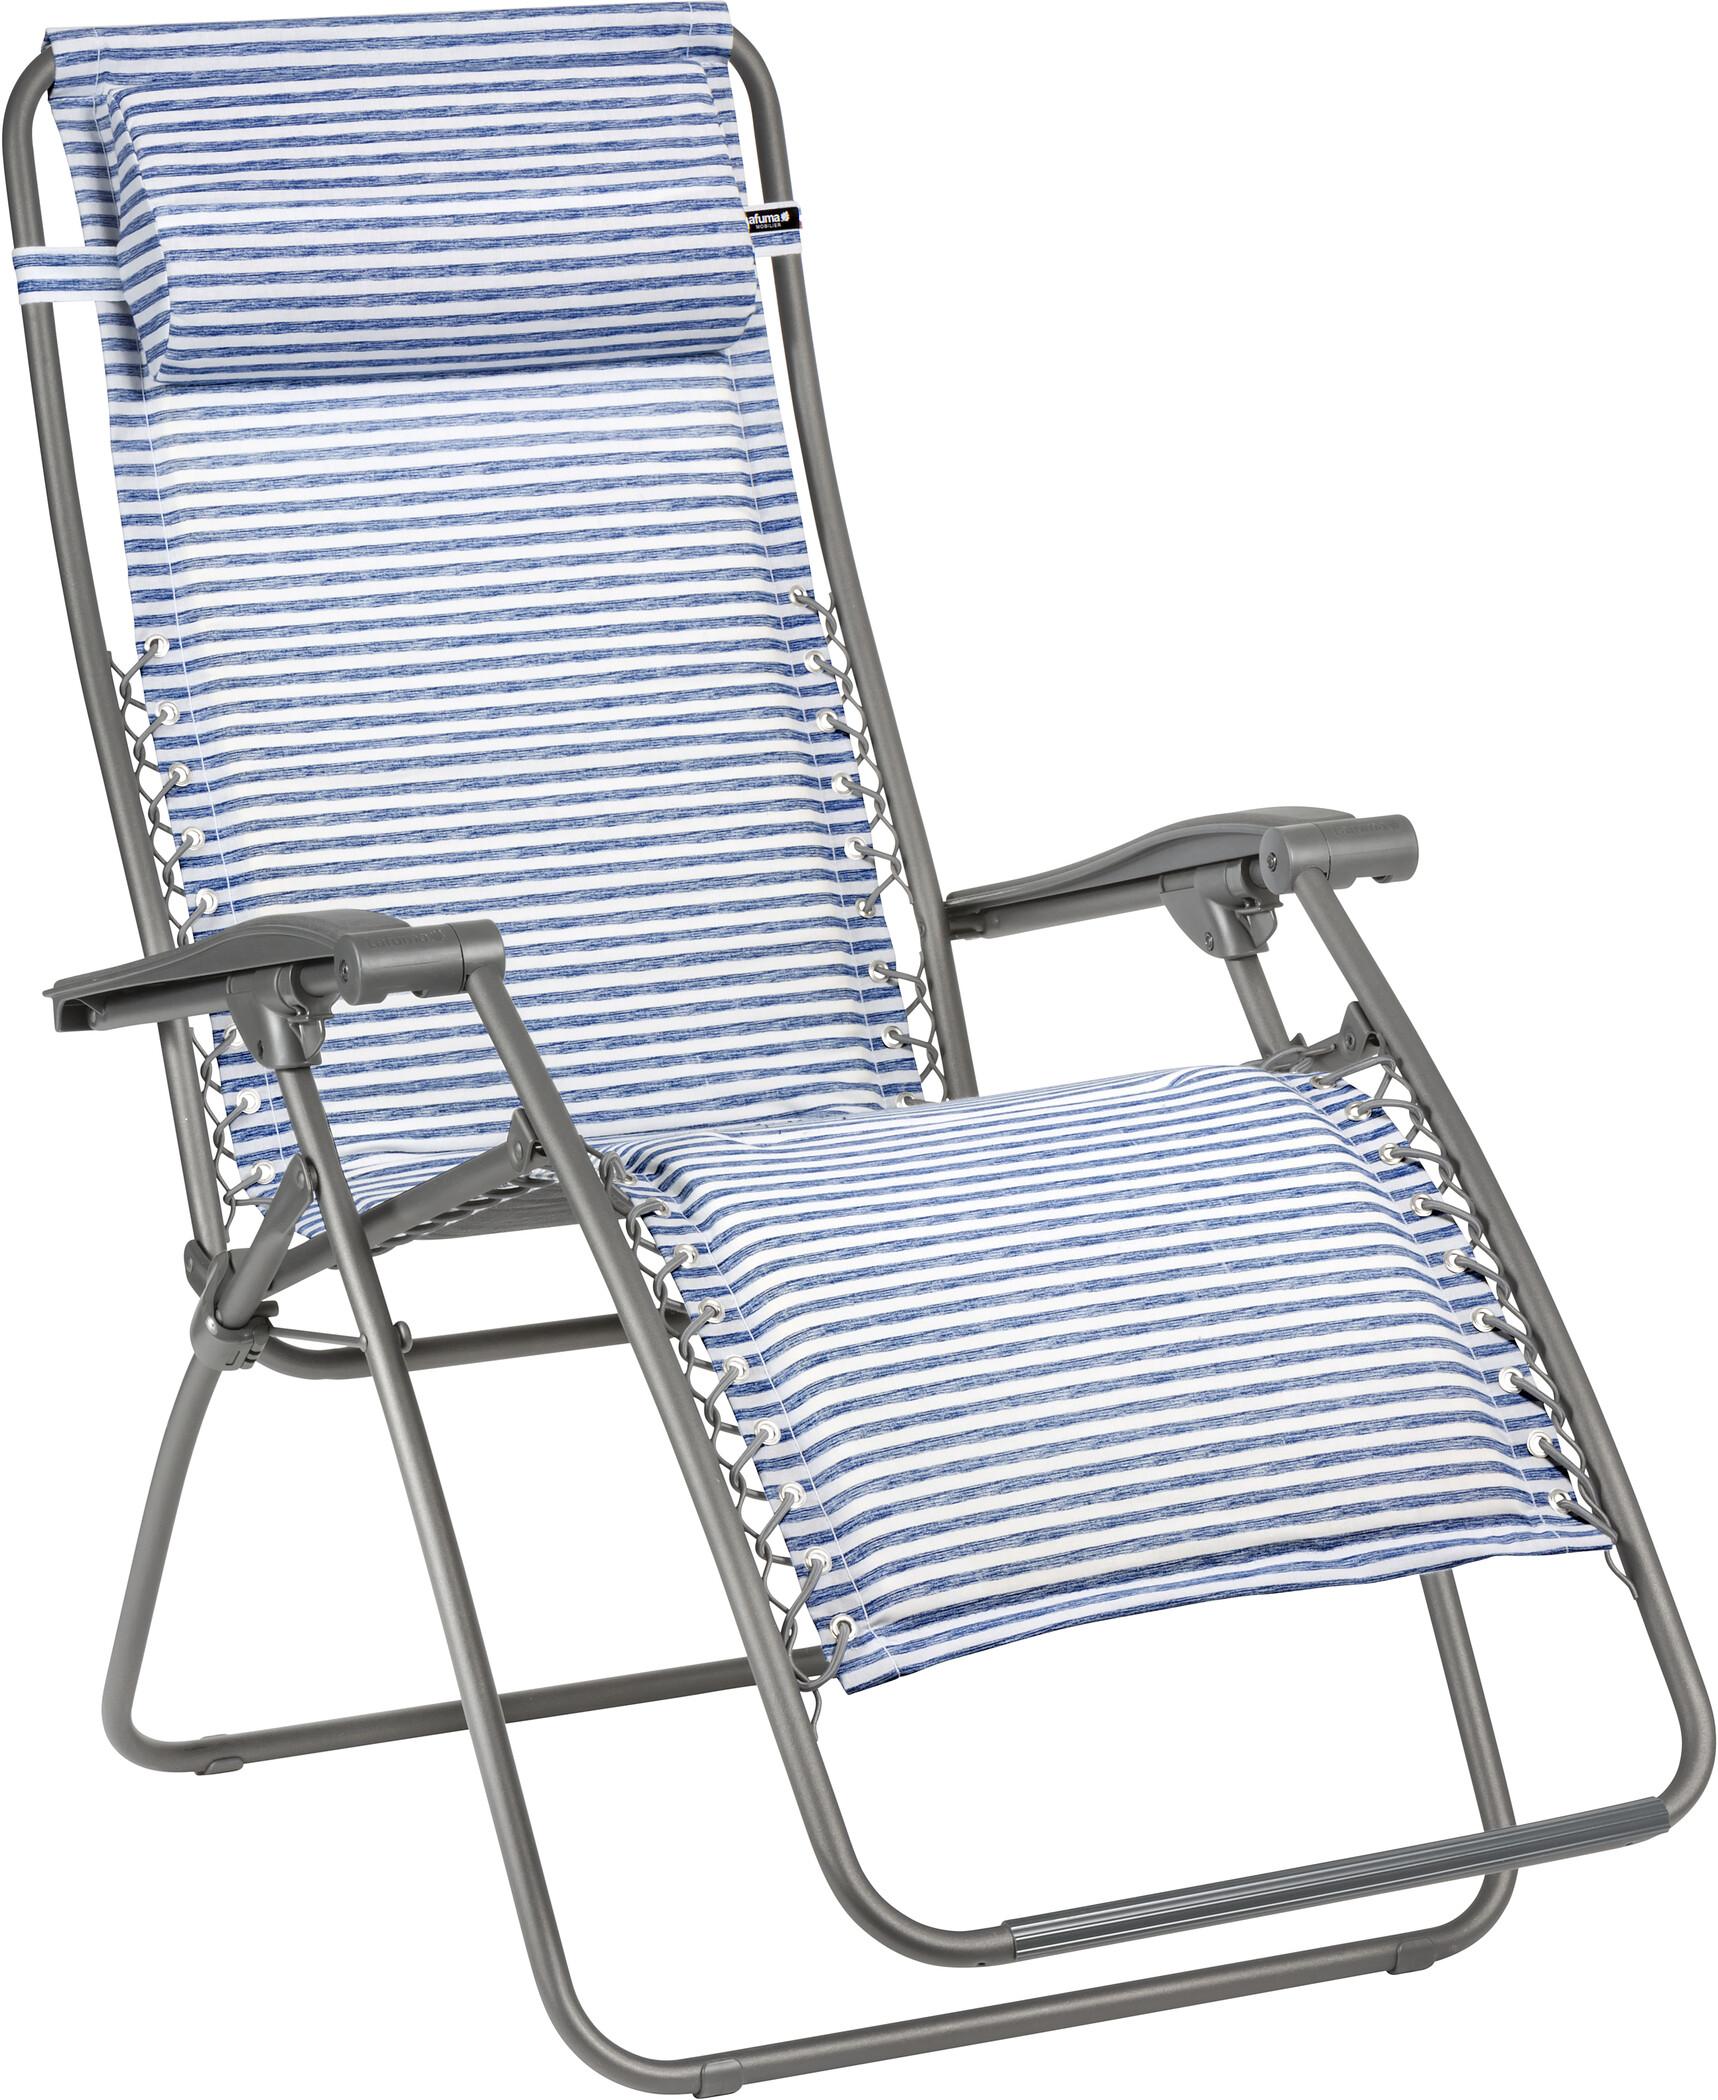 lafuma mobilier rsx chaise longue polycoton titane marine